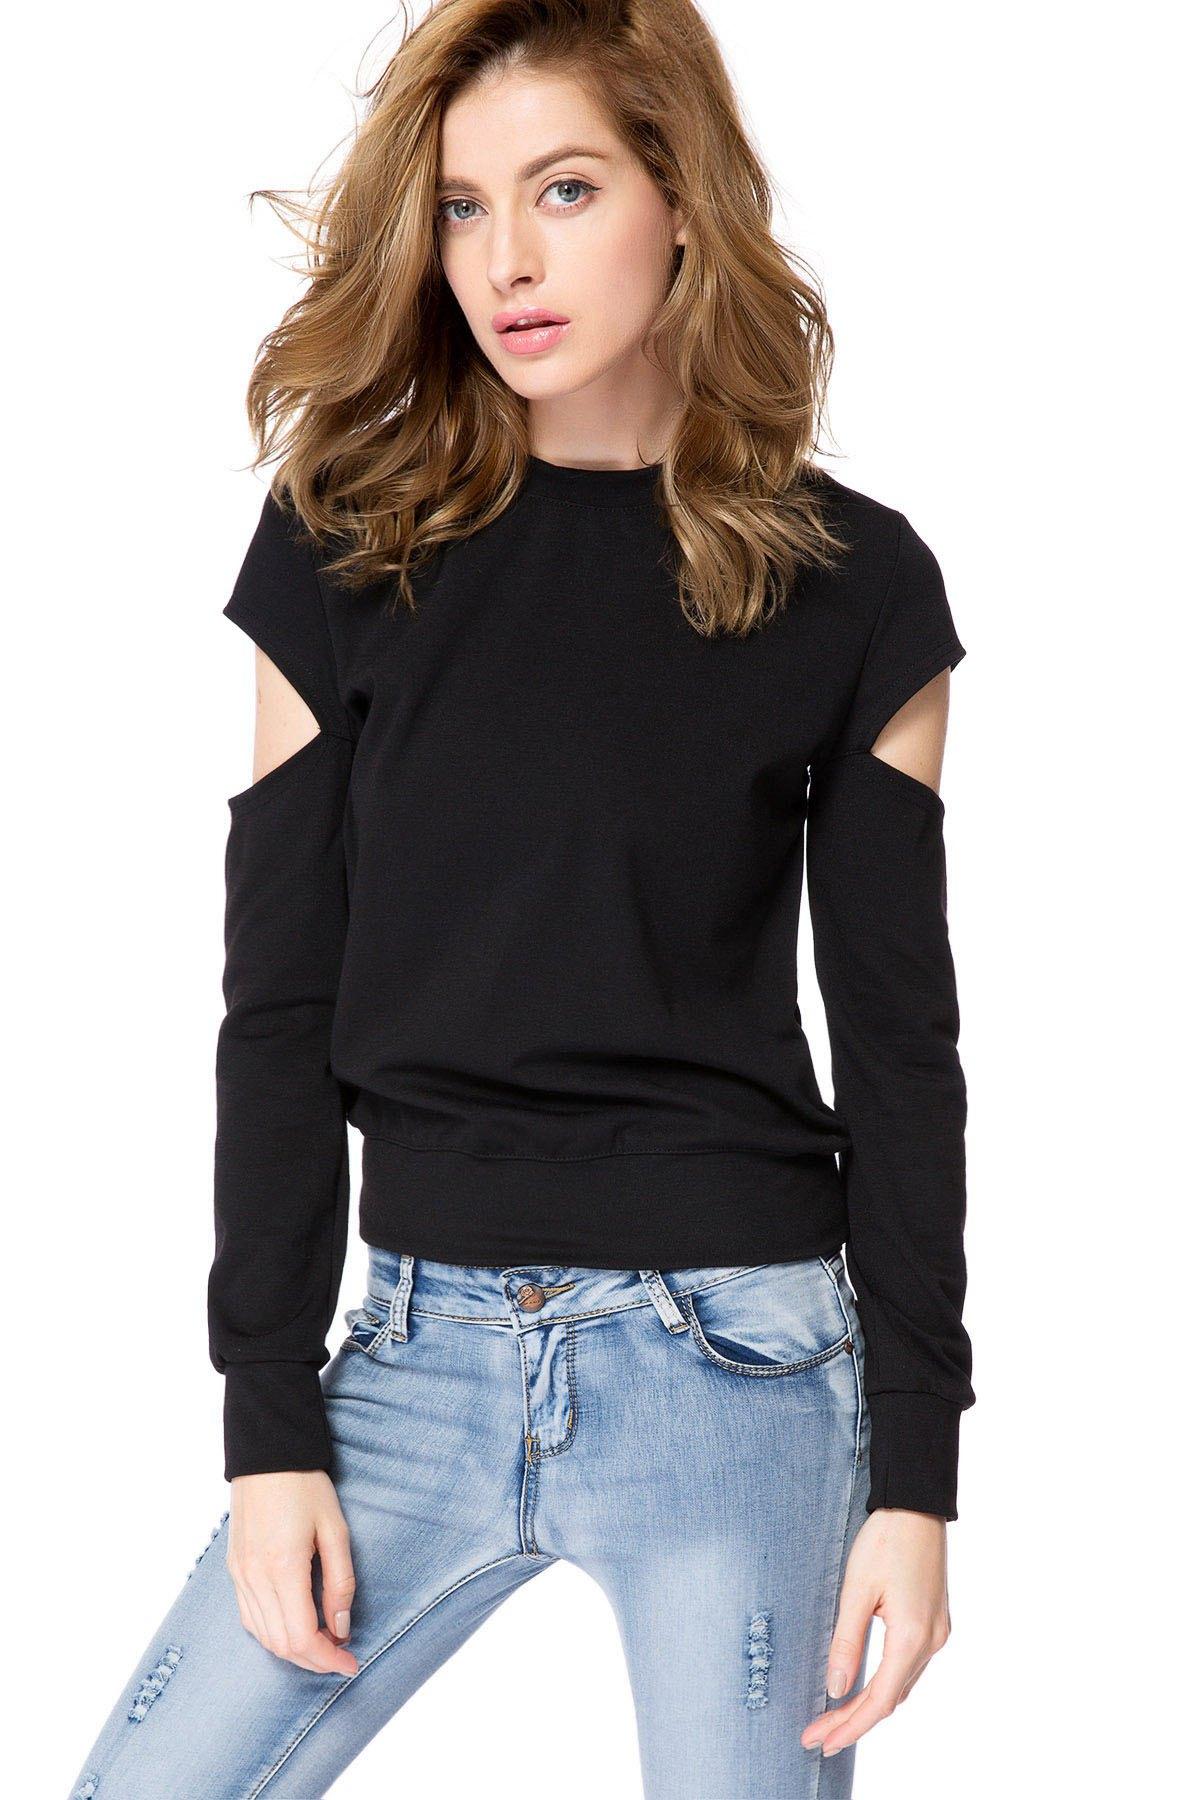 Buy Black Long Sleeve Cut Out Sweatshirt BLACK 2XL